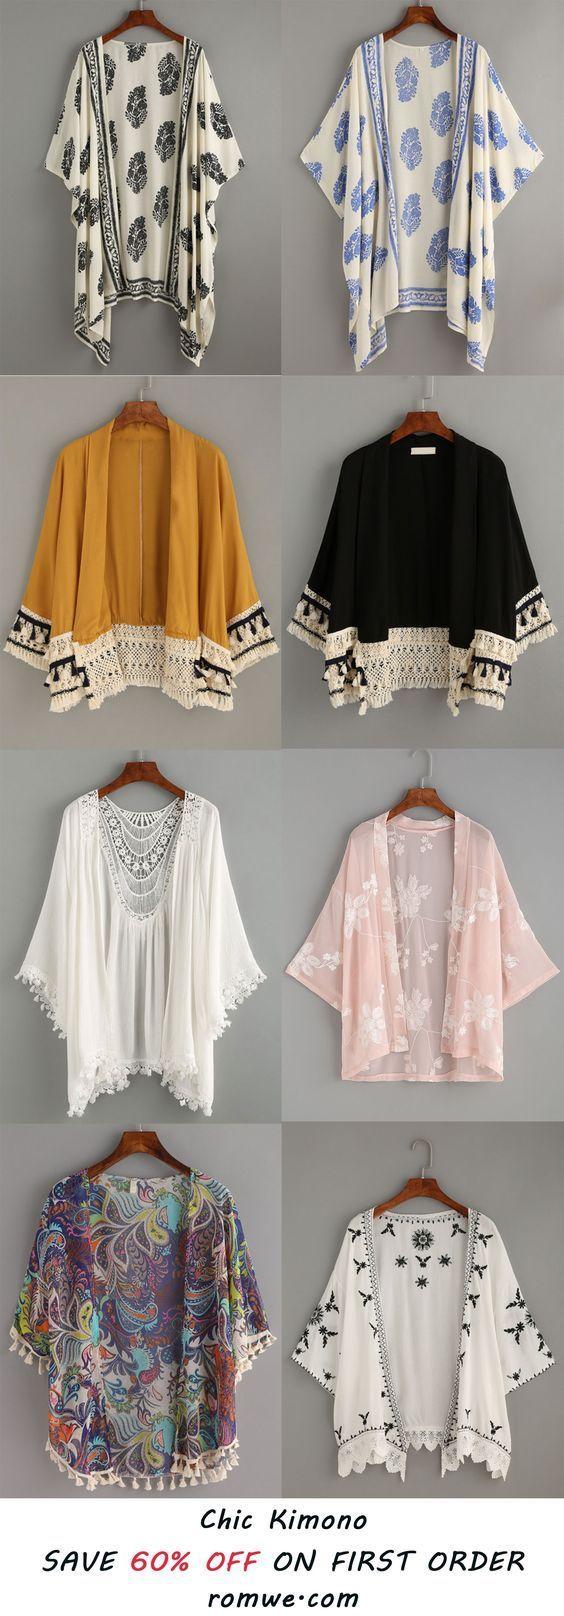 Toujours en avoir dans son armoire Chic Kimono 2017 -romwe.com